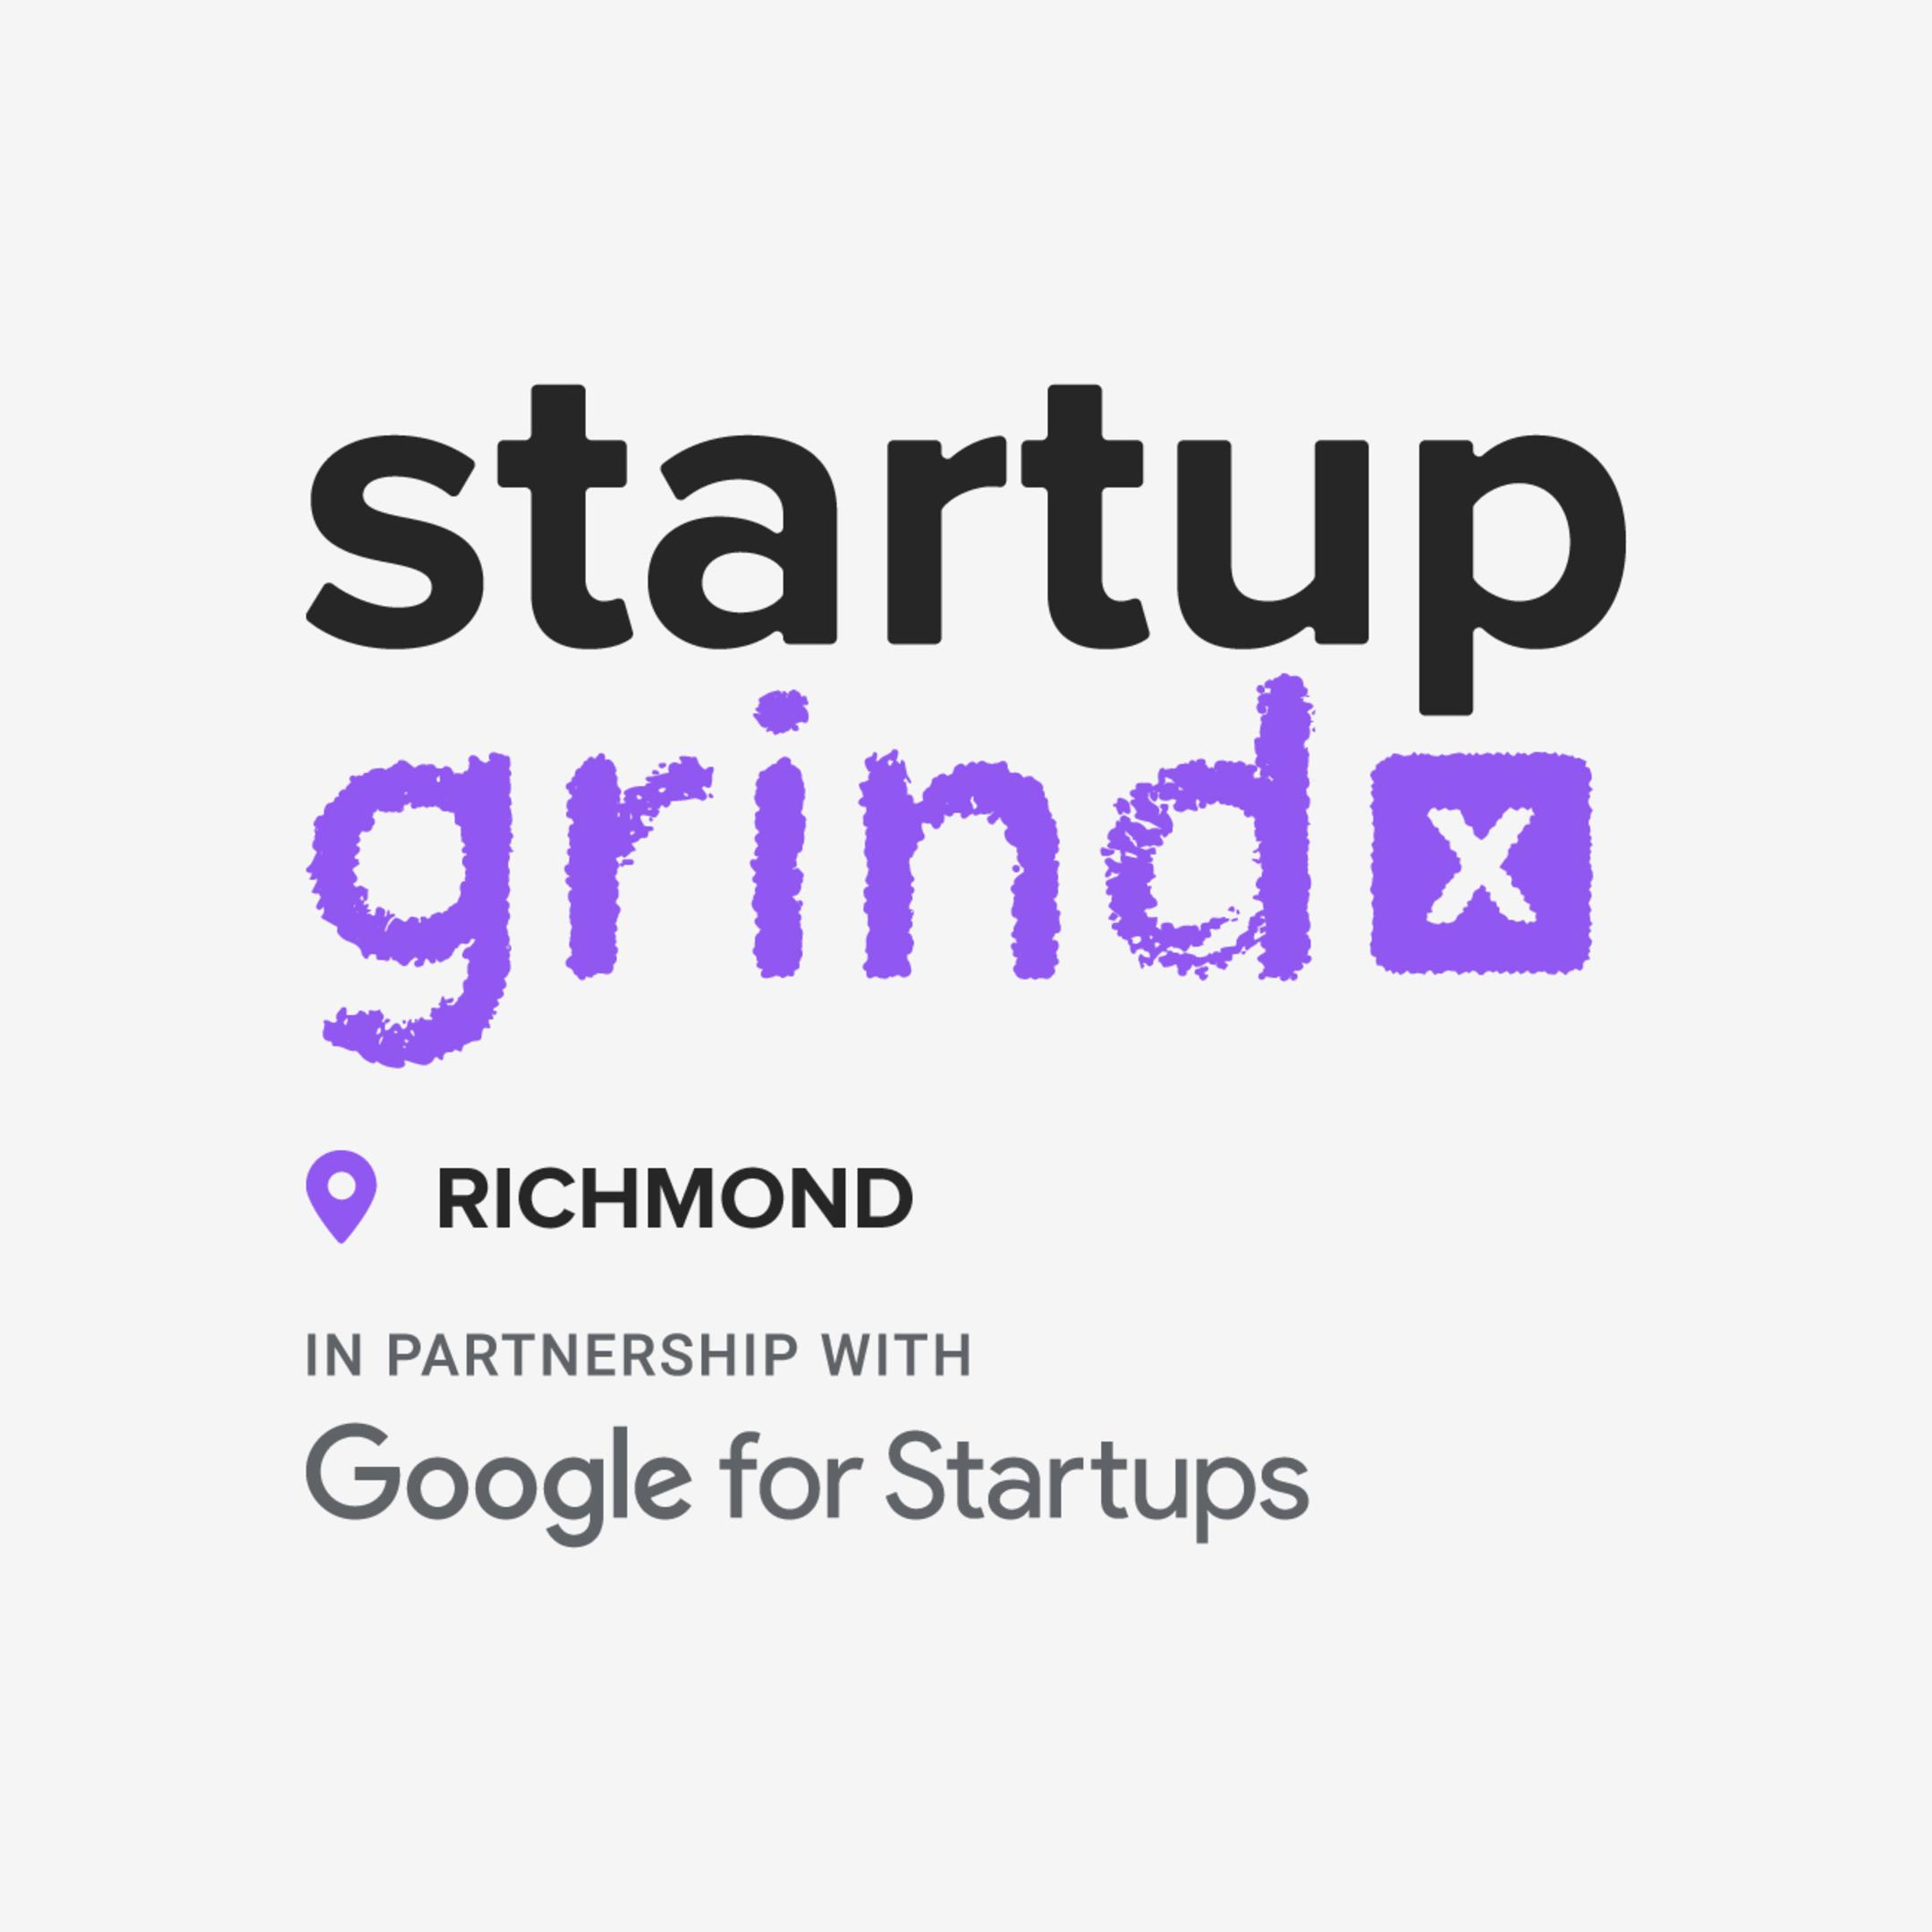 Startup Grind Richmond 2020 Kickoff Party x Speed Mentoring